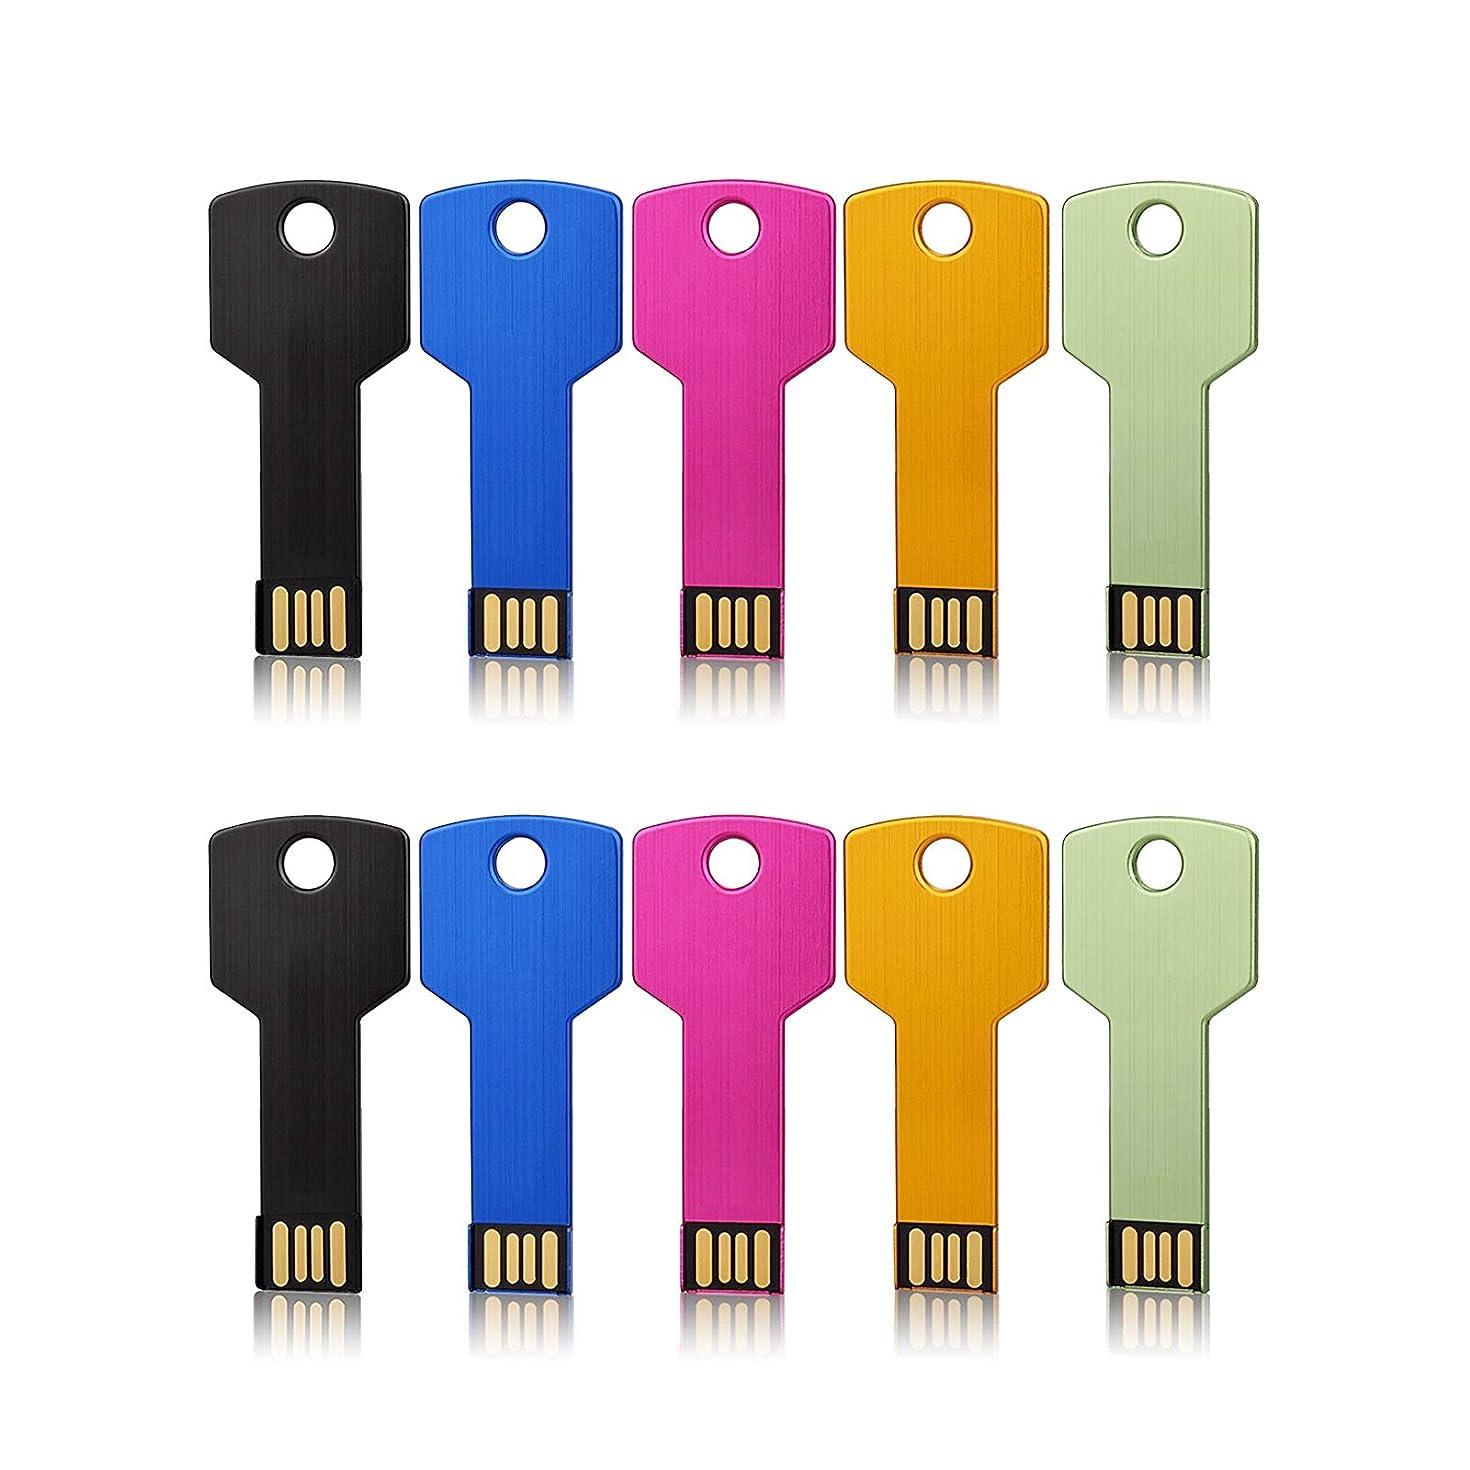 JUANWE 10 Pack 32GB USB Flash Drive USB 2.0 Metal Thumb Drives Jump Drive Memory Stick Key Shape